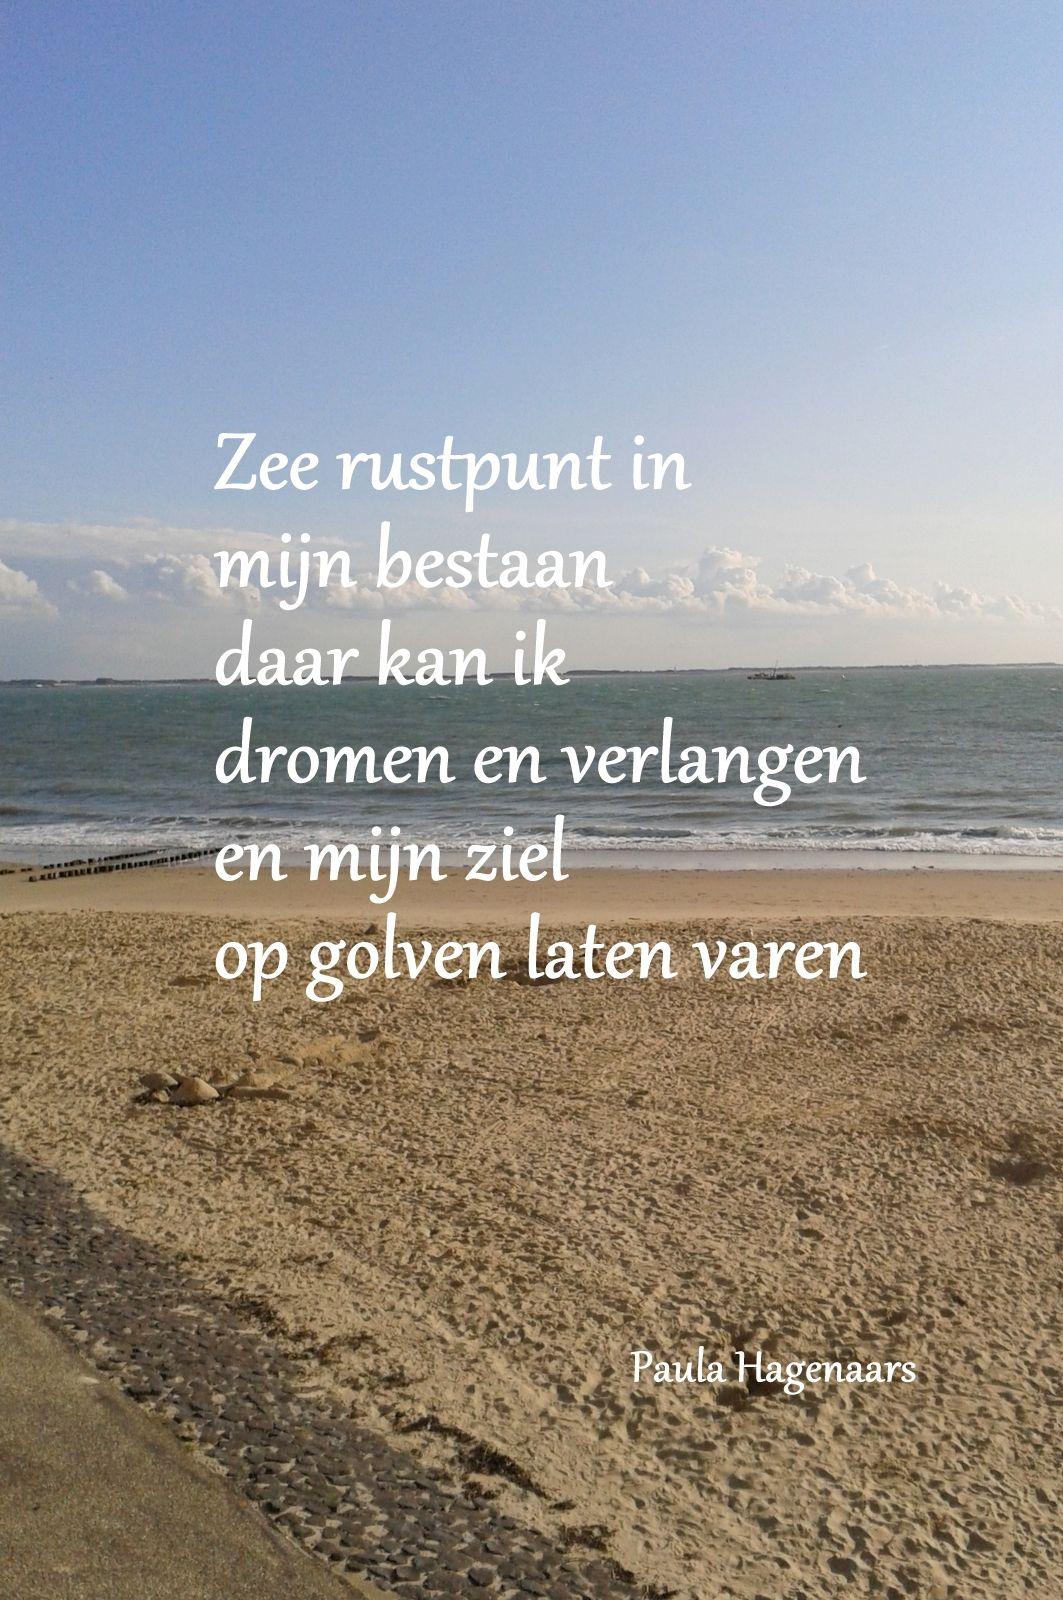 Citaten Over Engelen : Strand vlissingen the netherlands mooie citaten citaten